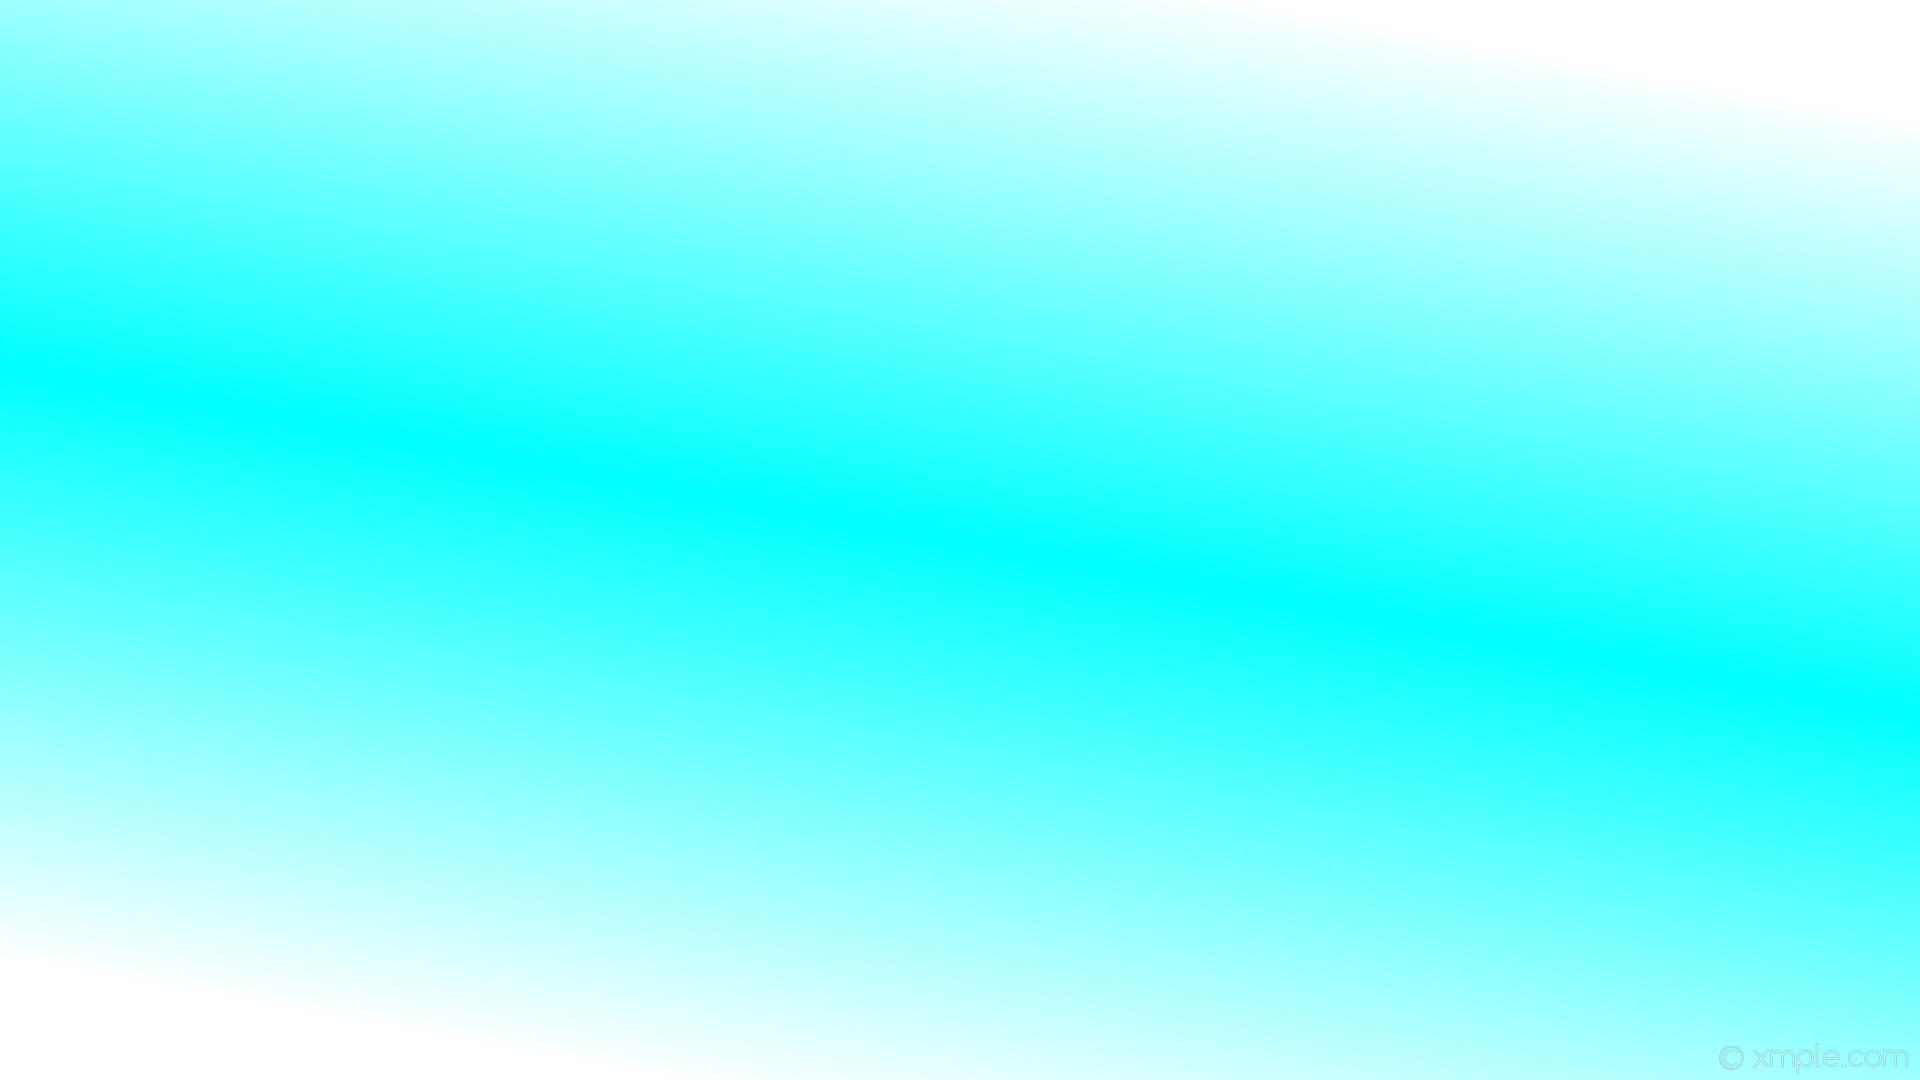 Res: 1920x1080, wallpaper blue white gradient highlight linear aqua cyan #ffffff #00ffff  240° 50%